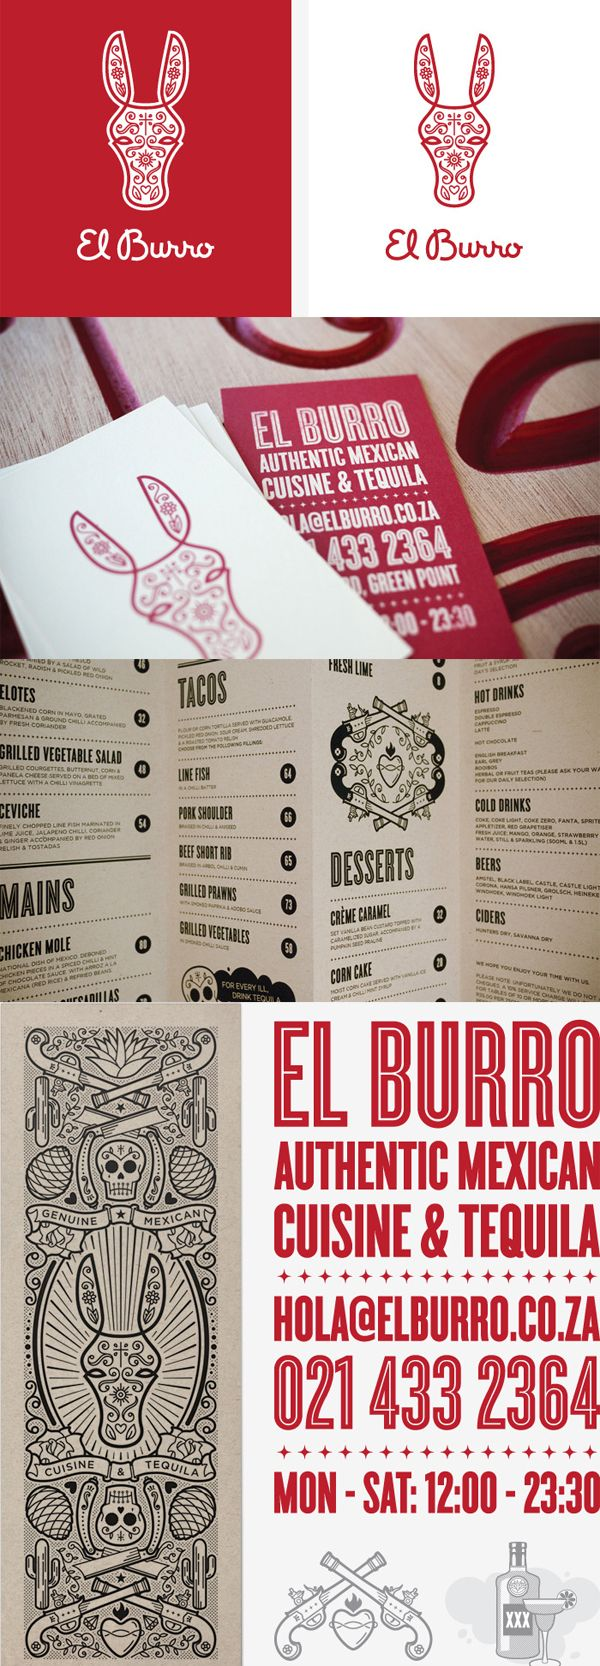 El Burro | Monday Design | http://www.mondaydesign.co.za identity branding logo